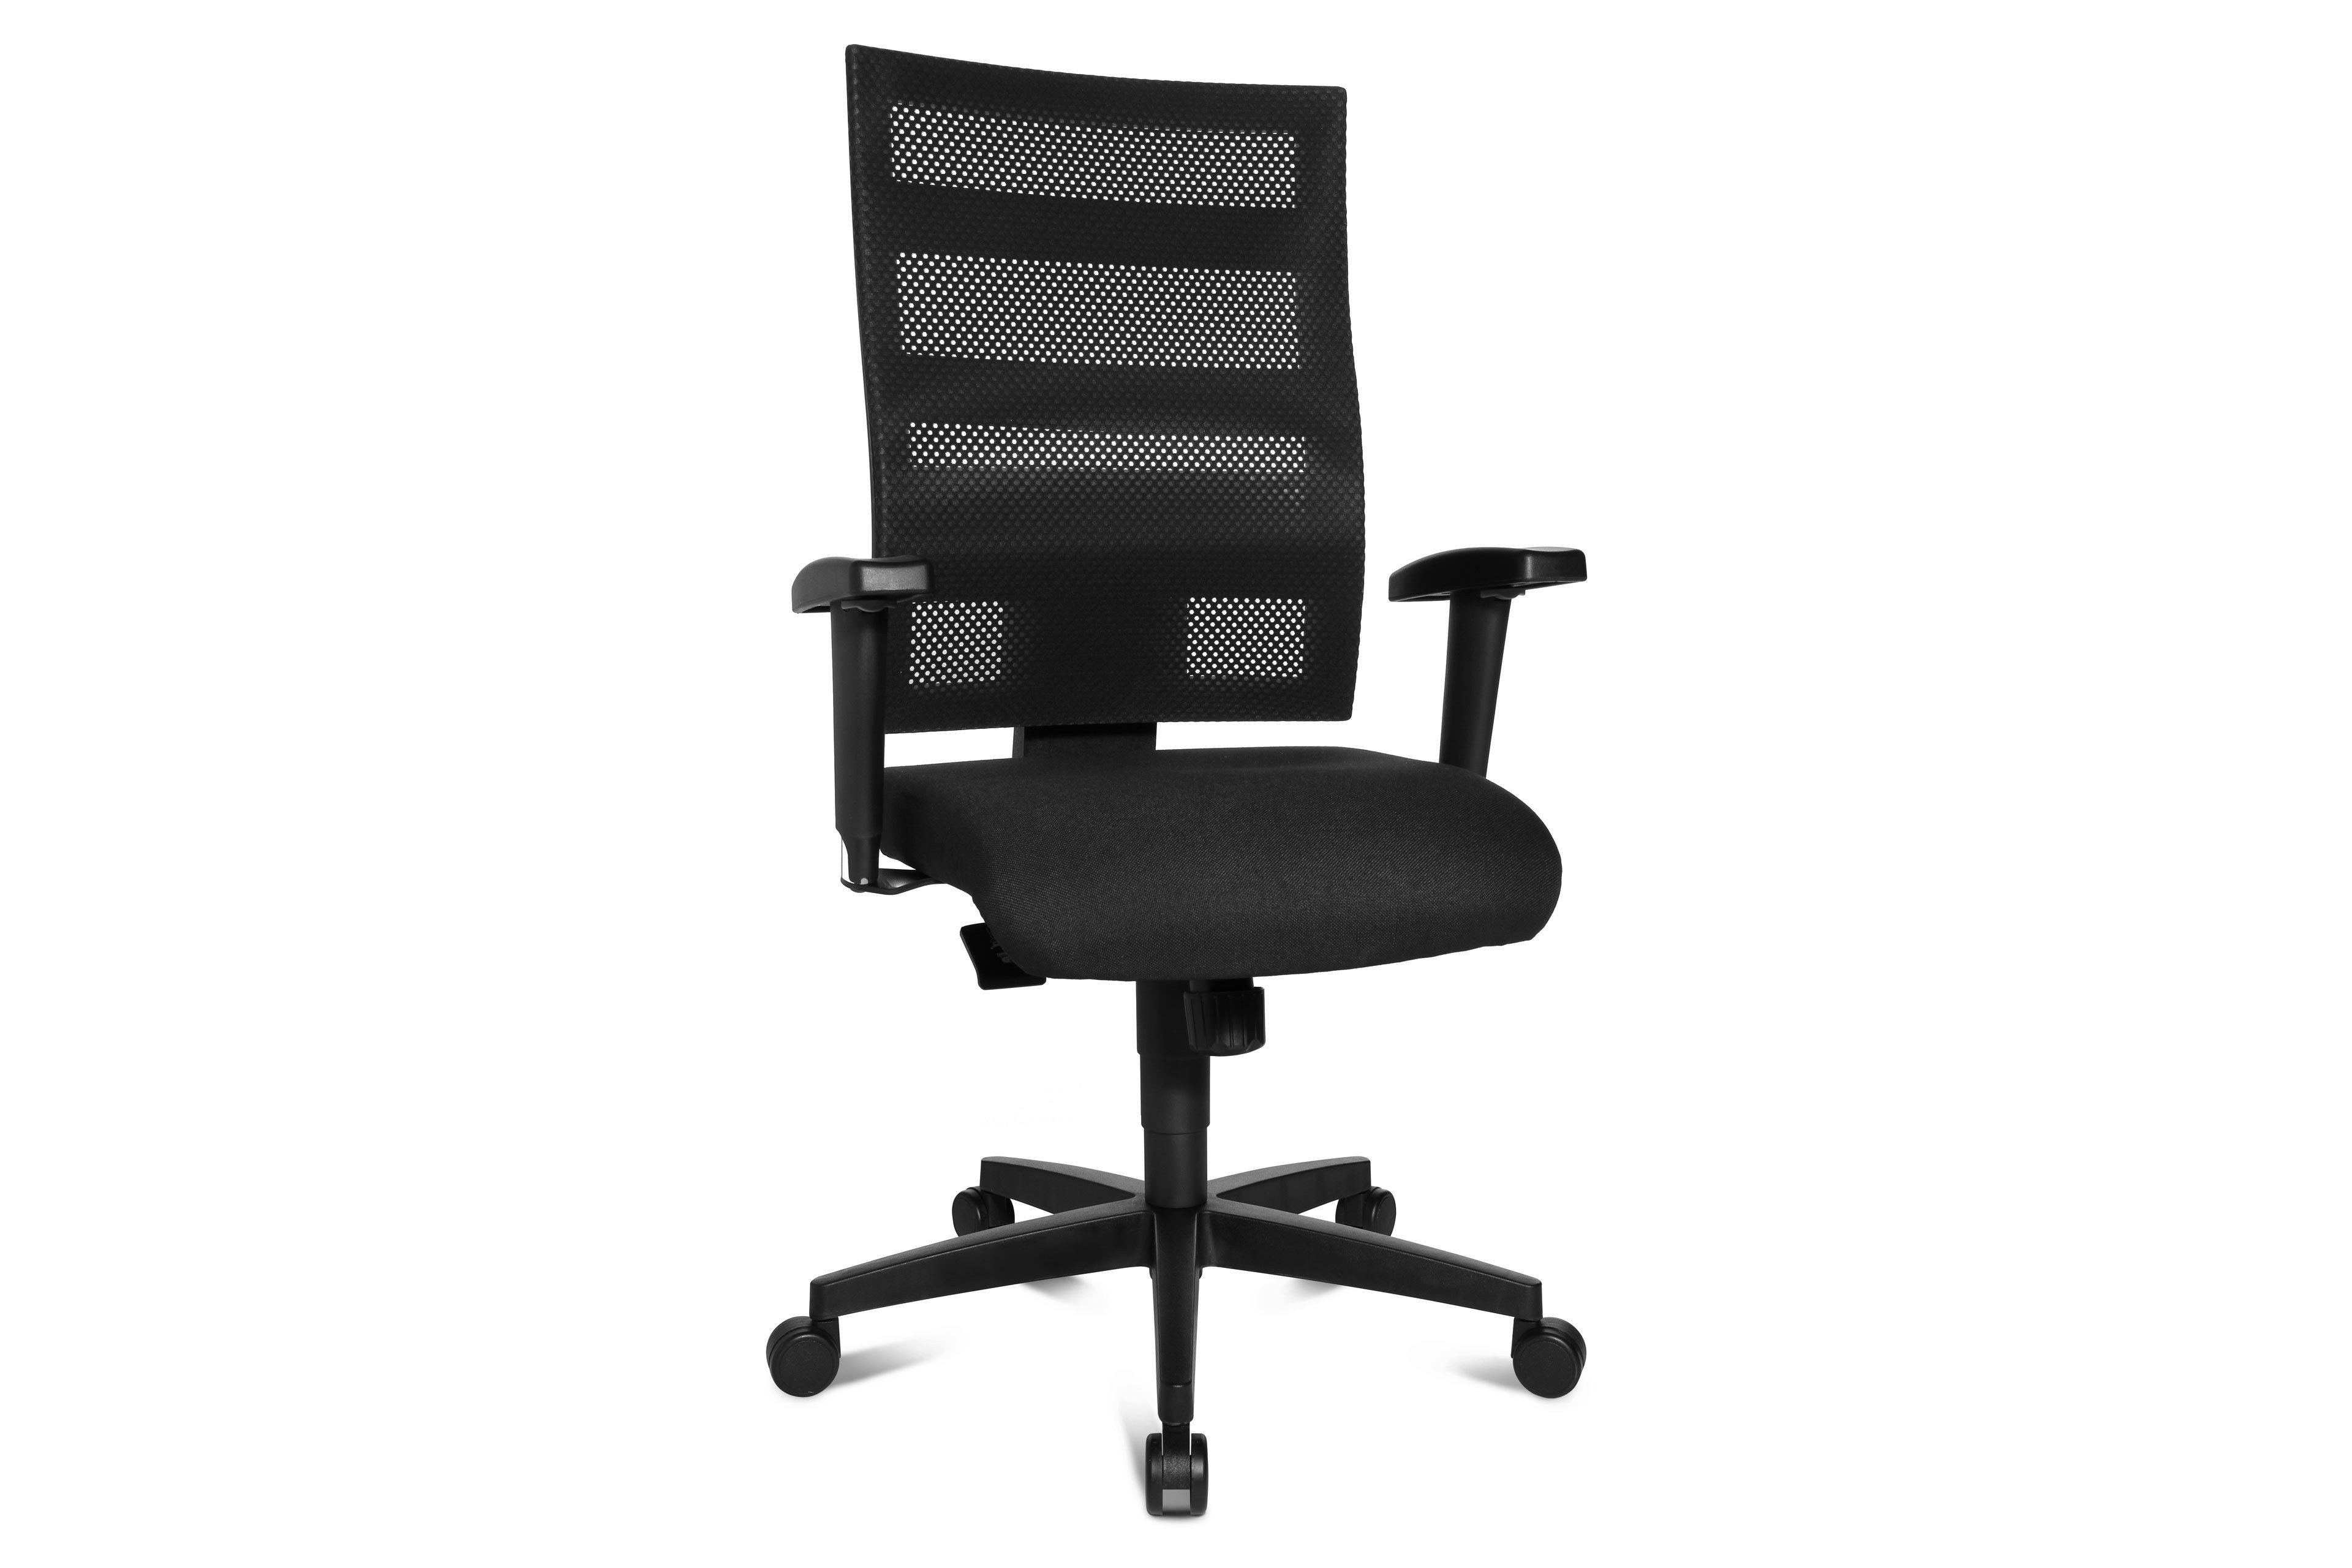 Topstar Drehstuhl Linea 30 schwarz   Möbel Letz - Ihr Online-Shop